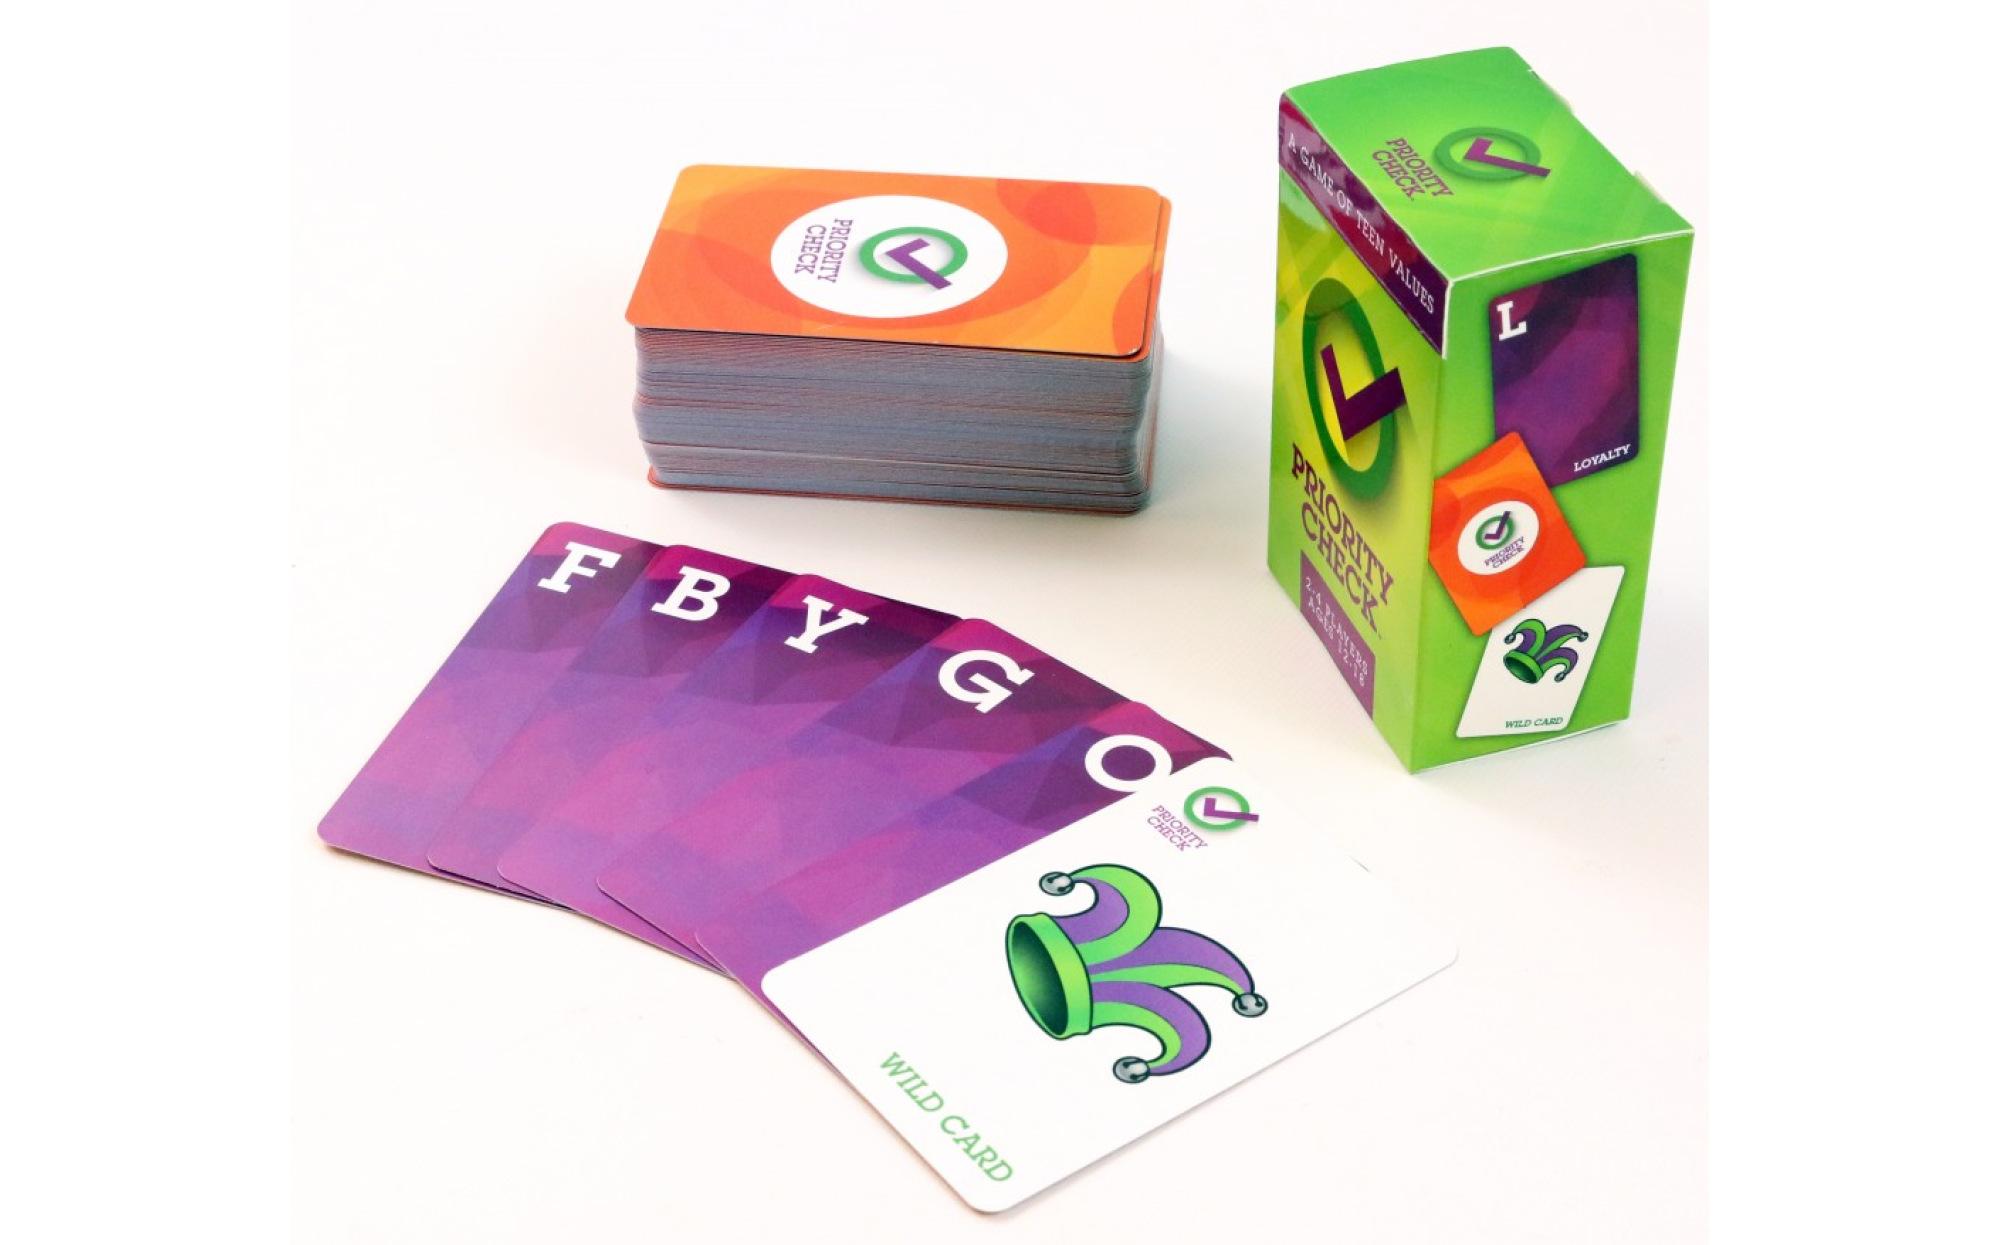 Priority Check A Game Of Teen Self Awareness Games